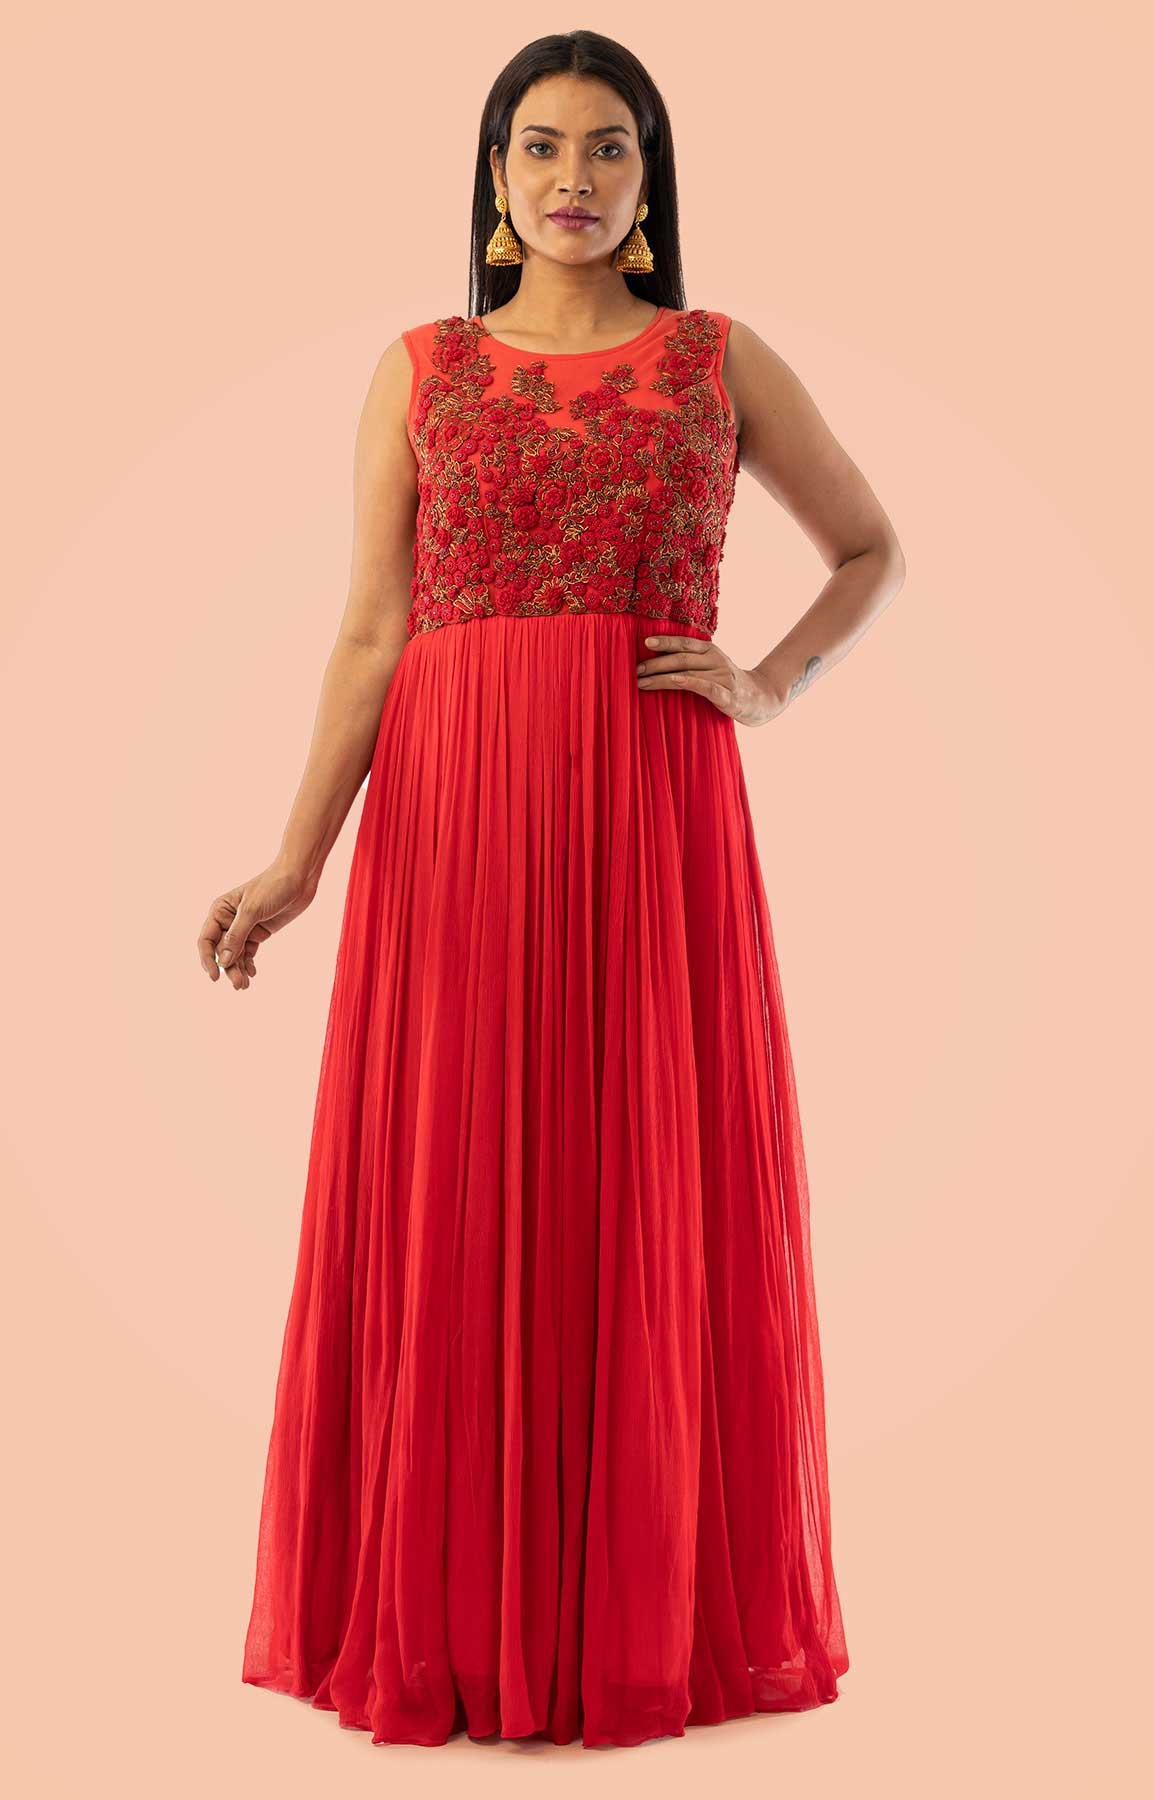 Red Chiffon Anarkali Suit Adorned With Thread And Moti Work – Viraaya By Ushnakmals